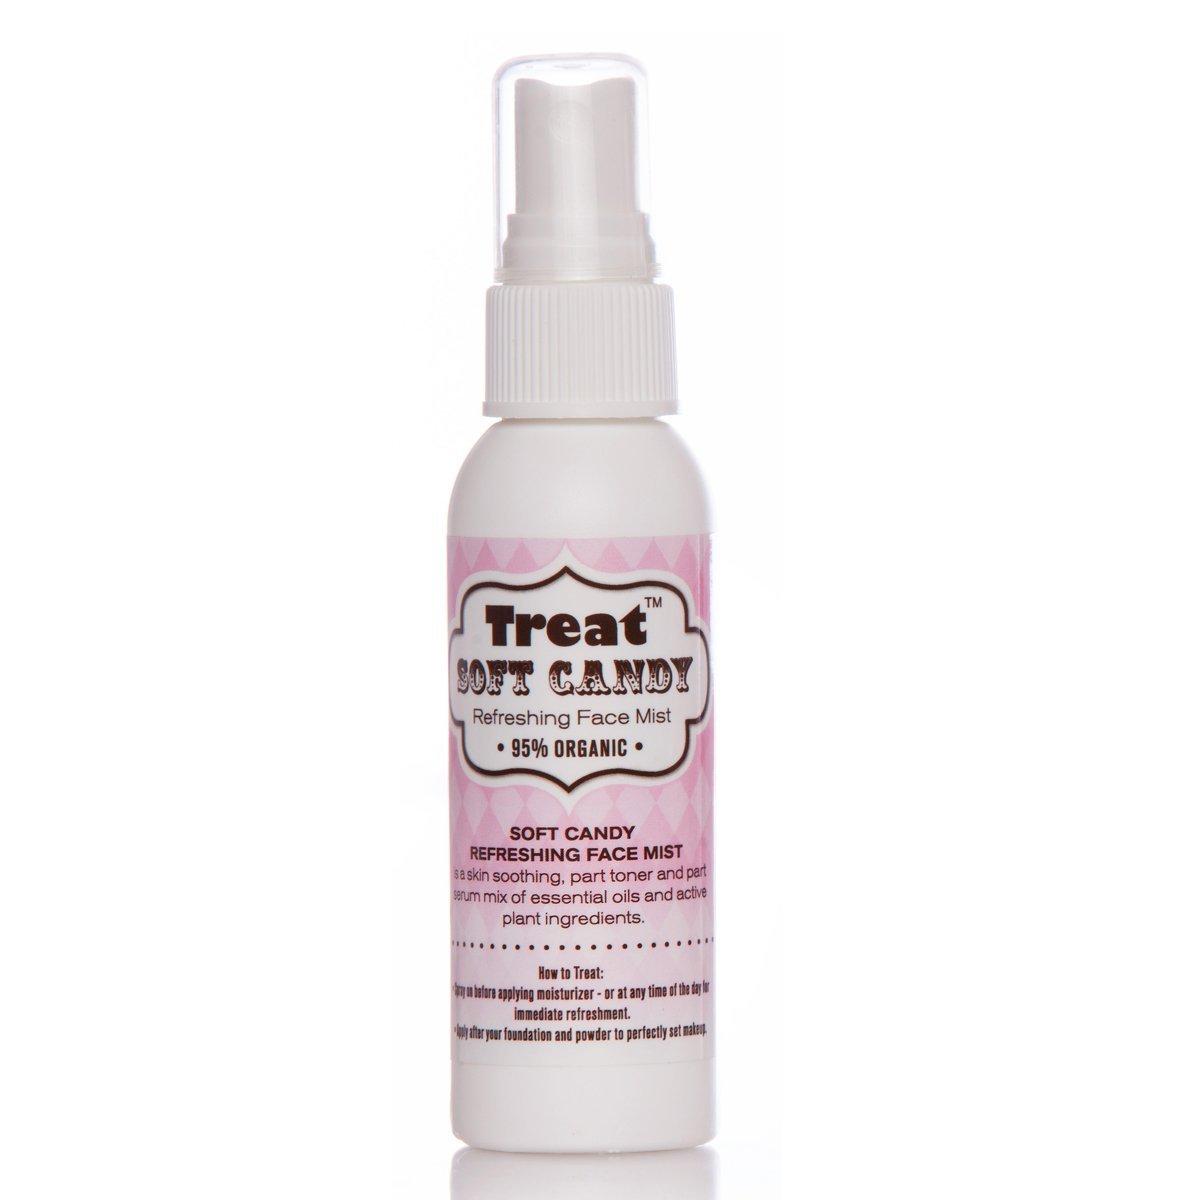 TREAT Refreshing Face Mist, Soft Candy Vanilla Buttercream